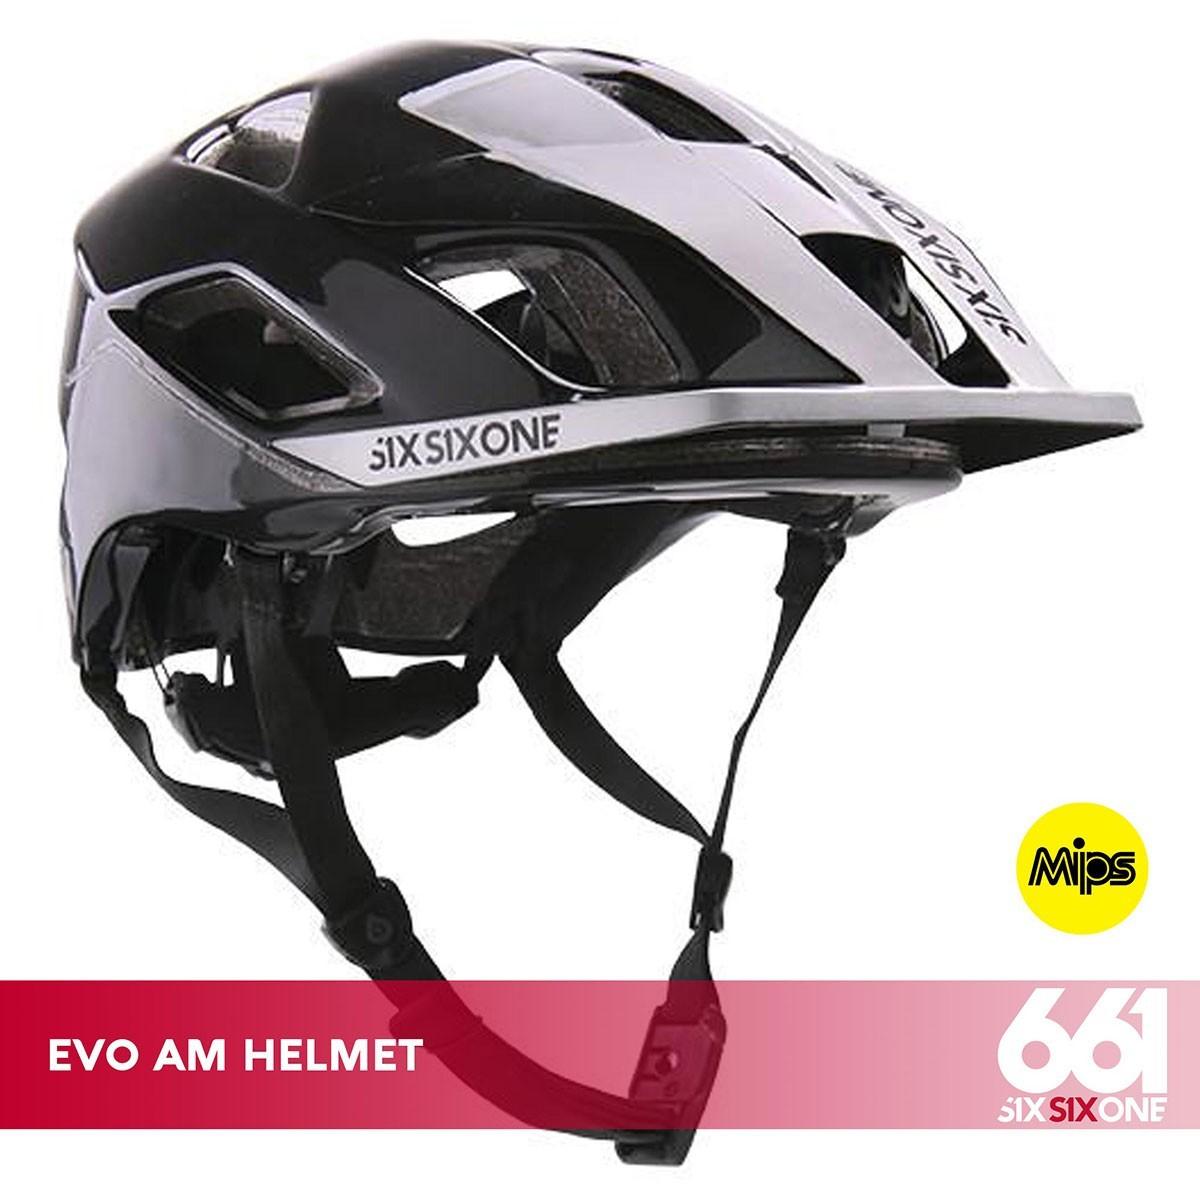 661 EVO AM MIPS CE METALLIC BLACK - Изображение - AQUAMATRIX